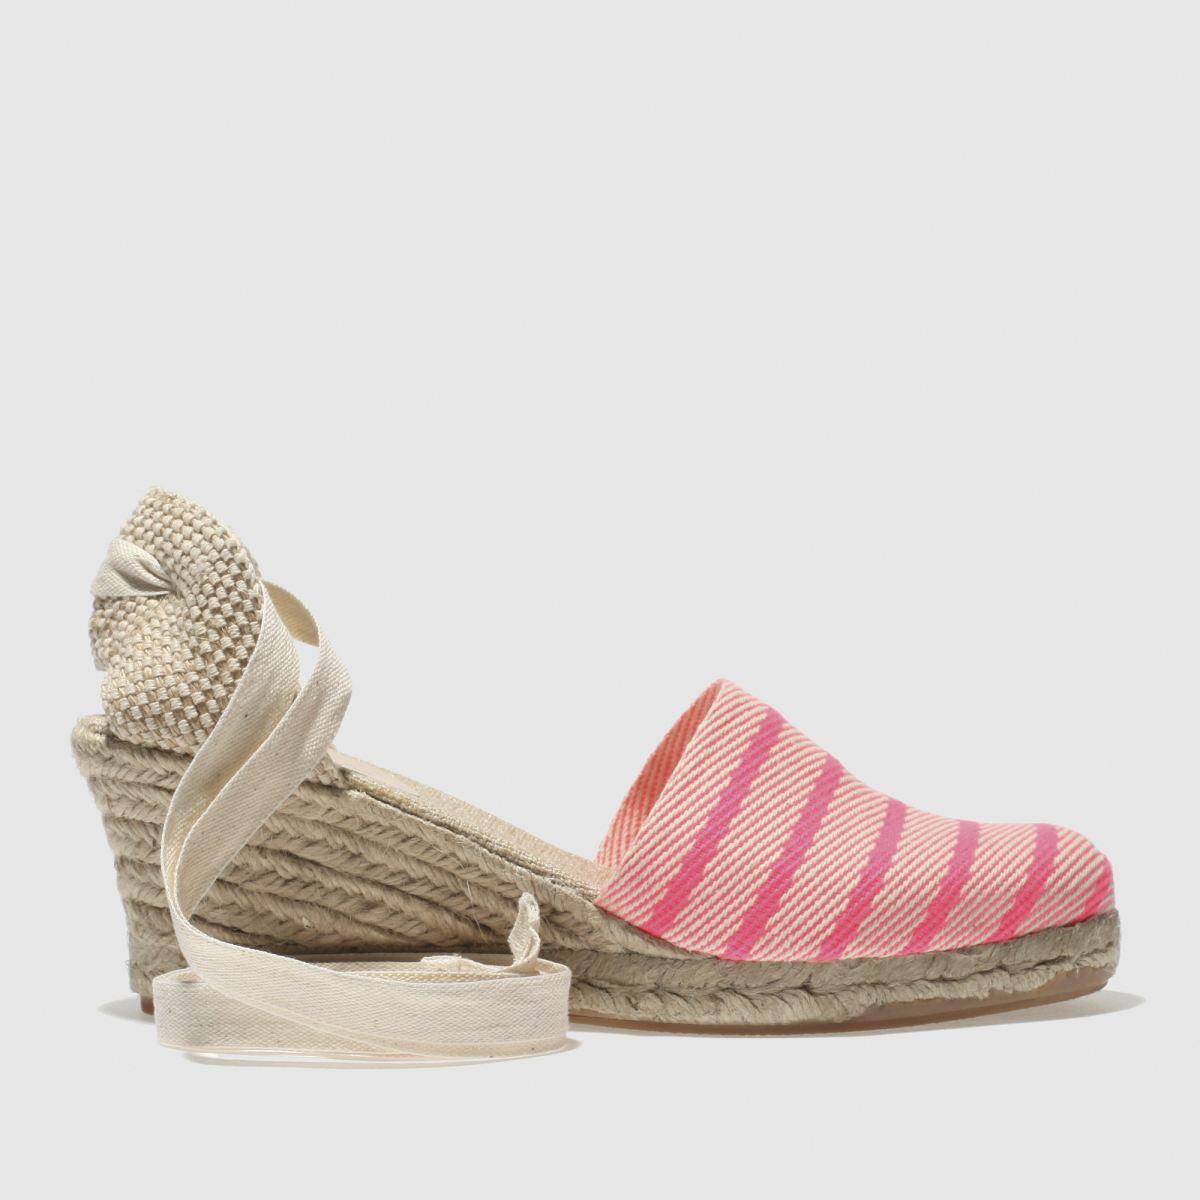 Schuh Pink Parade Ii Sandals